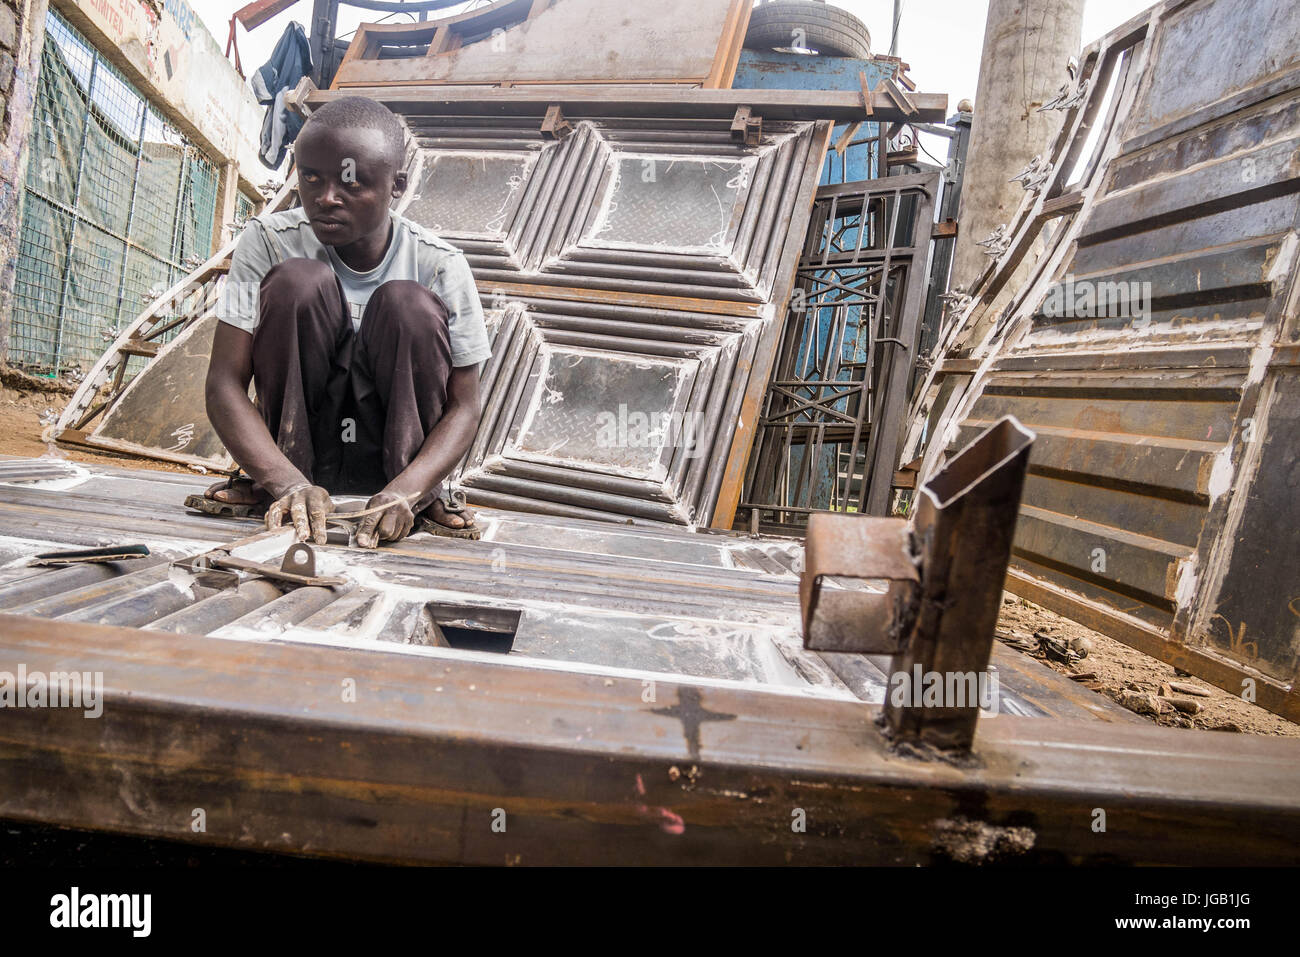 Nairobi, Kenya - December 2, 2016: Worker at welding workshop using sandpaper - Stock Image